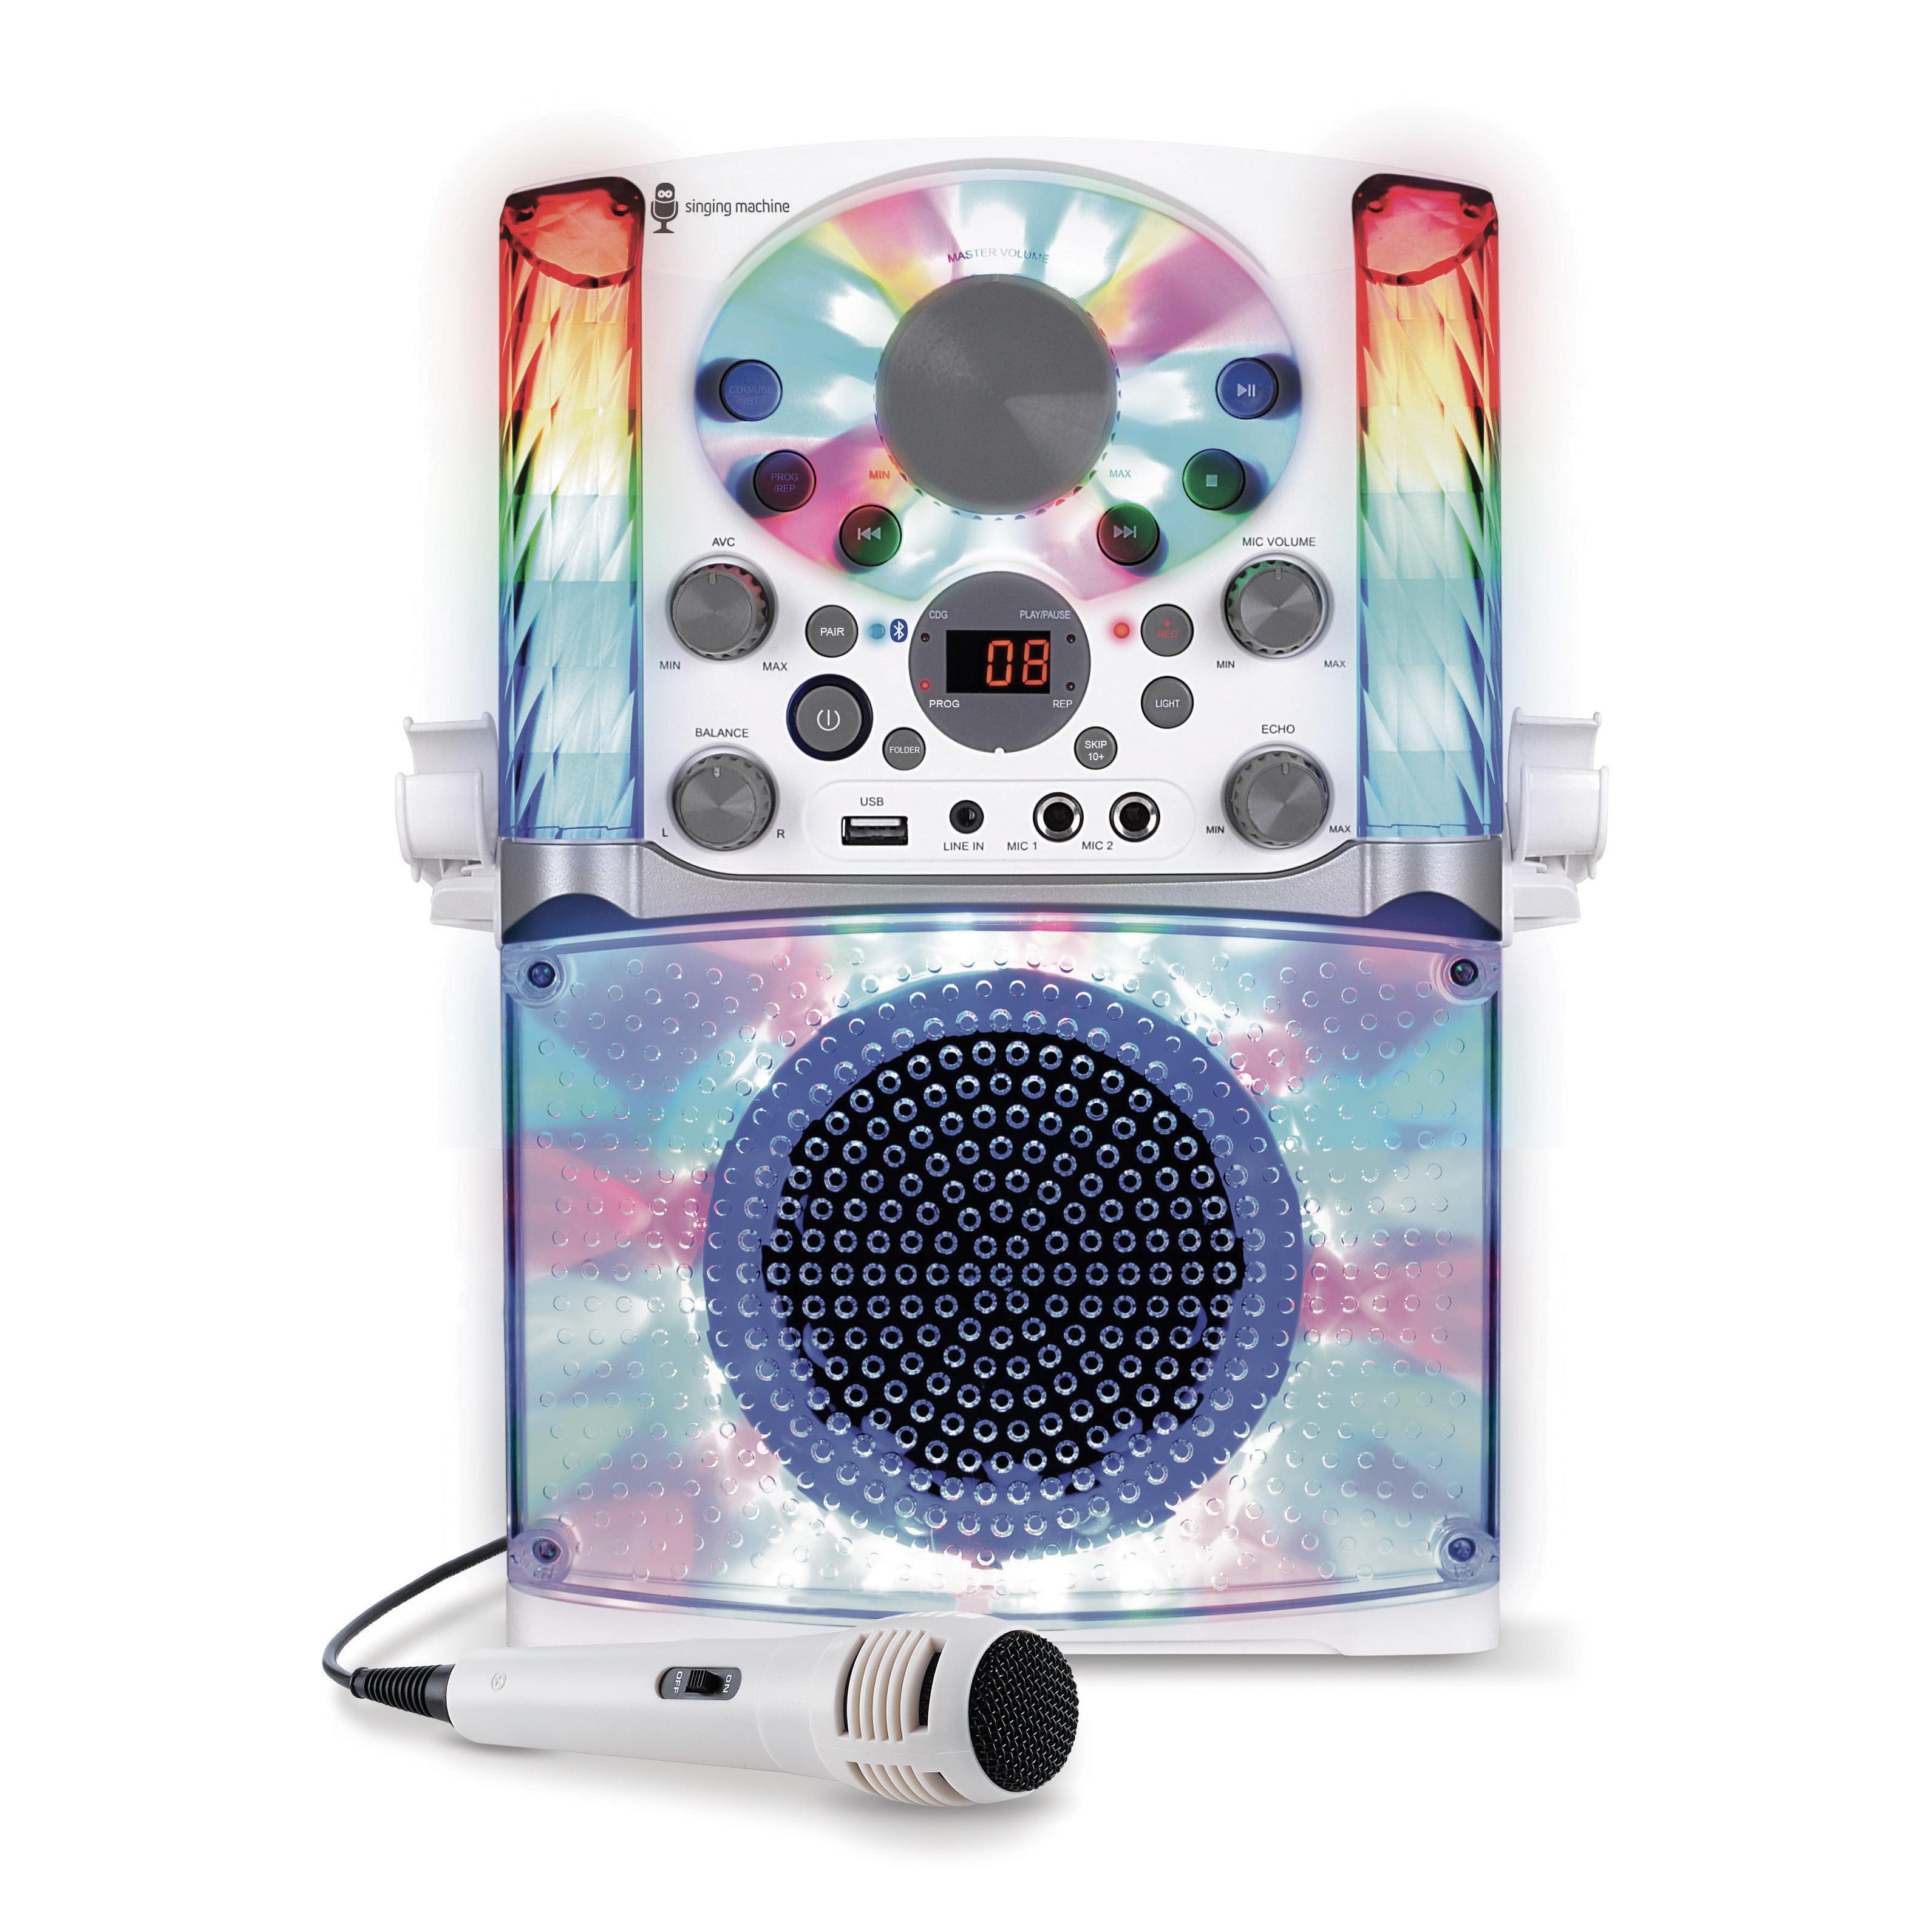 Zoom Karaoke Cdg Pop Chart Picks 2018 Part 4 Karaoke Entertainment Free Modern Musicals Cdg Karaoke Cdgs, Dvds & Media